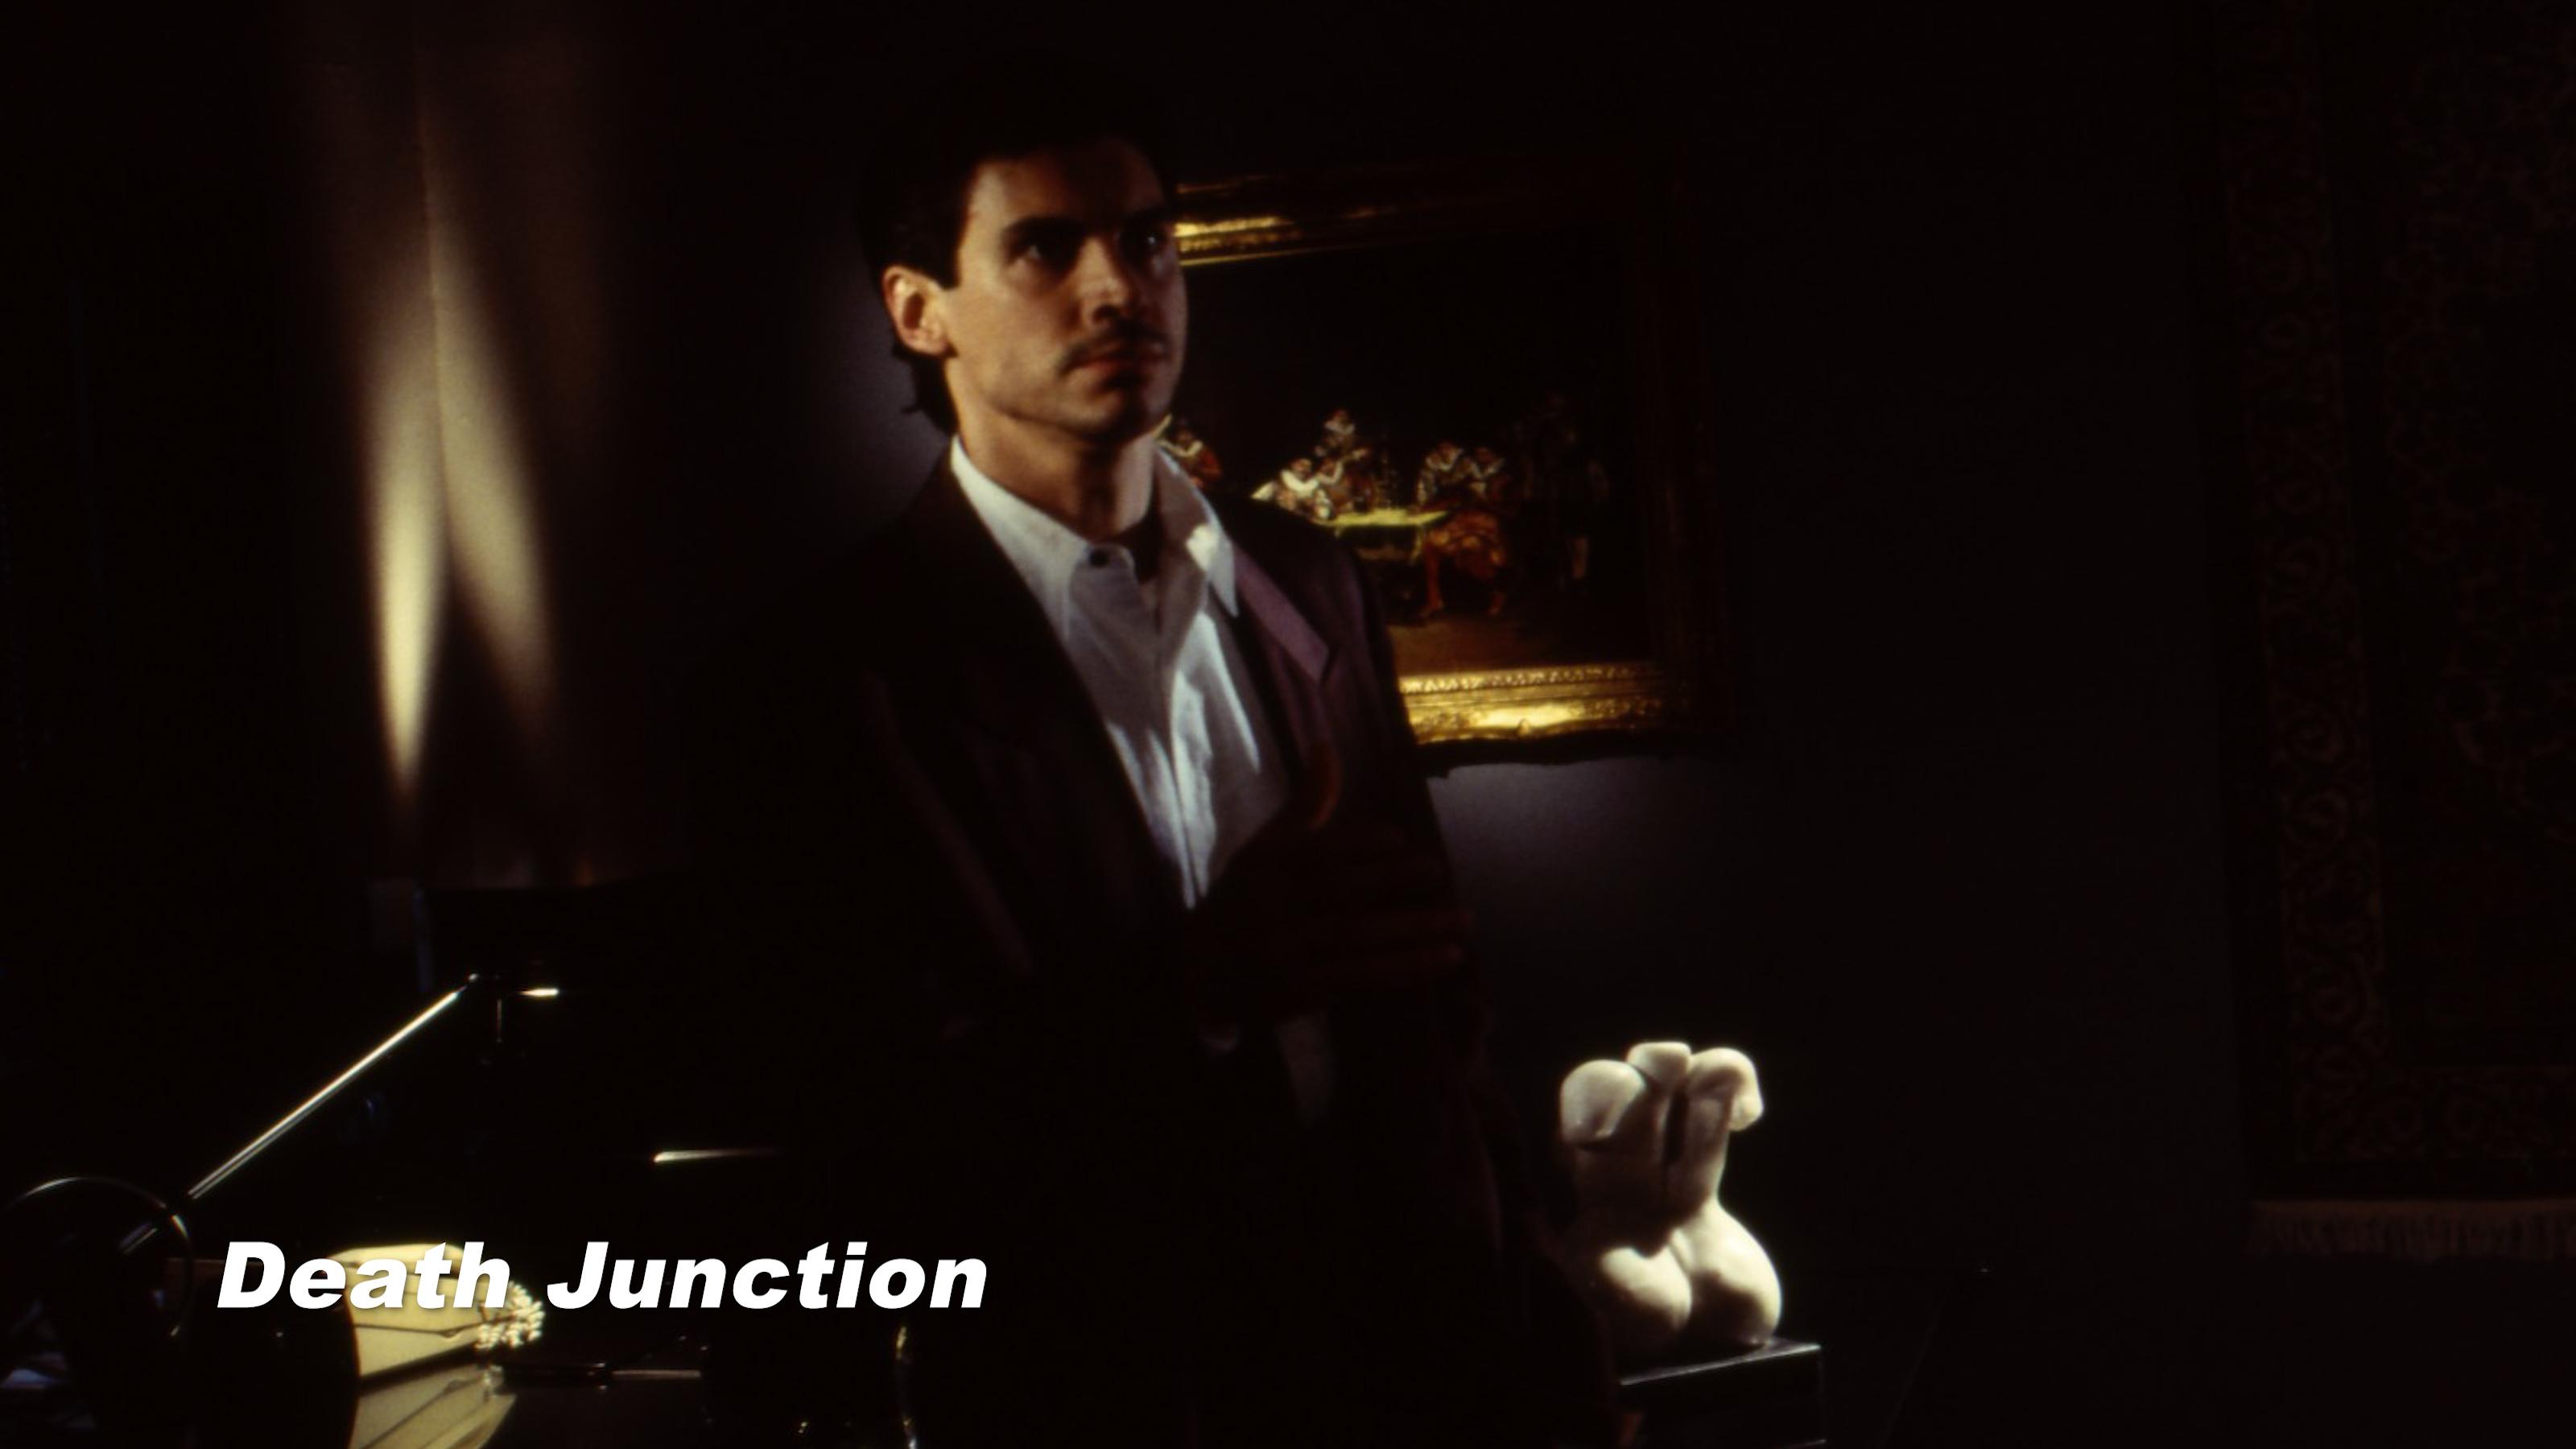 Death Junction